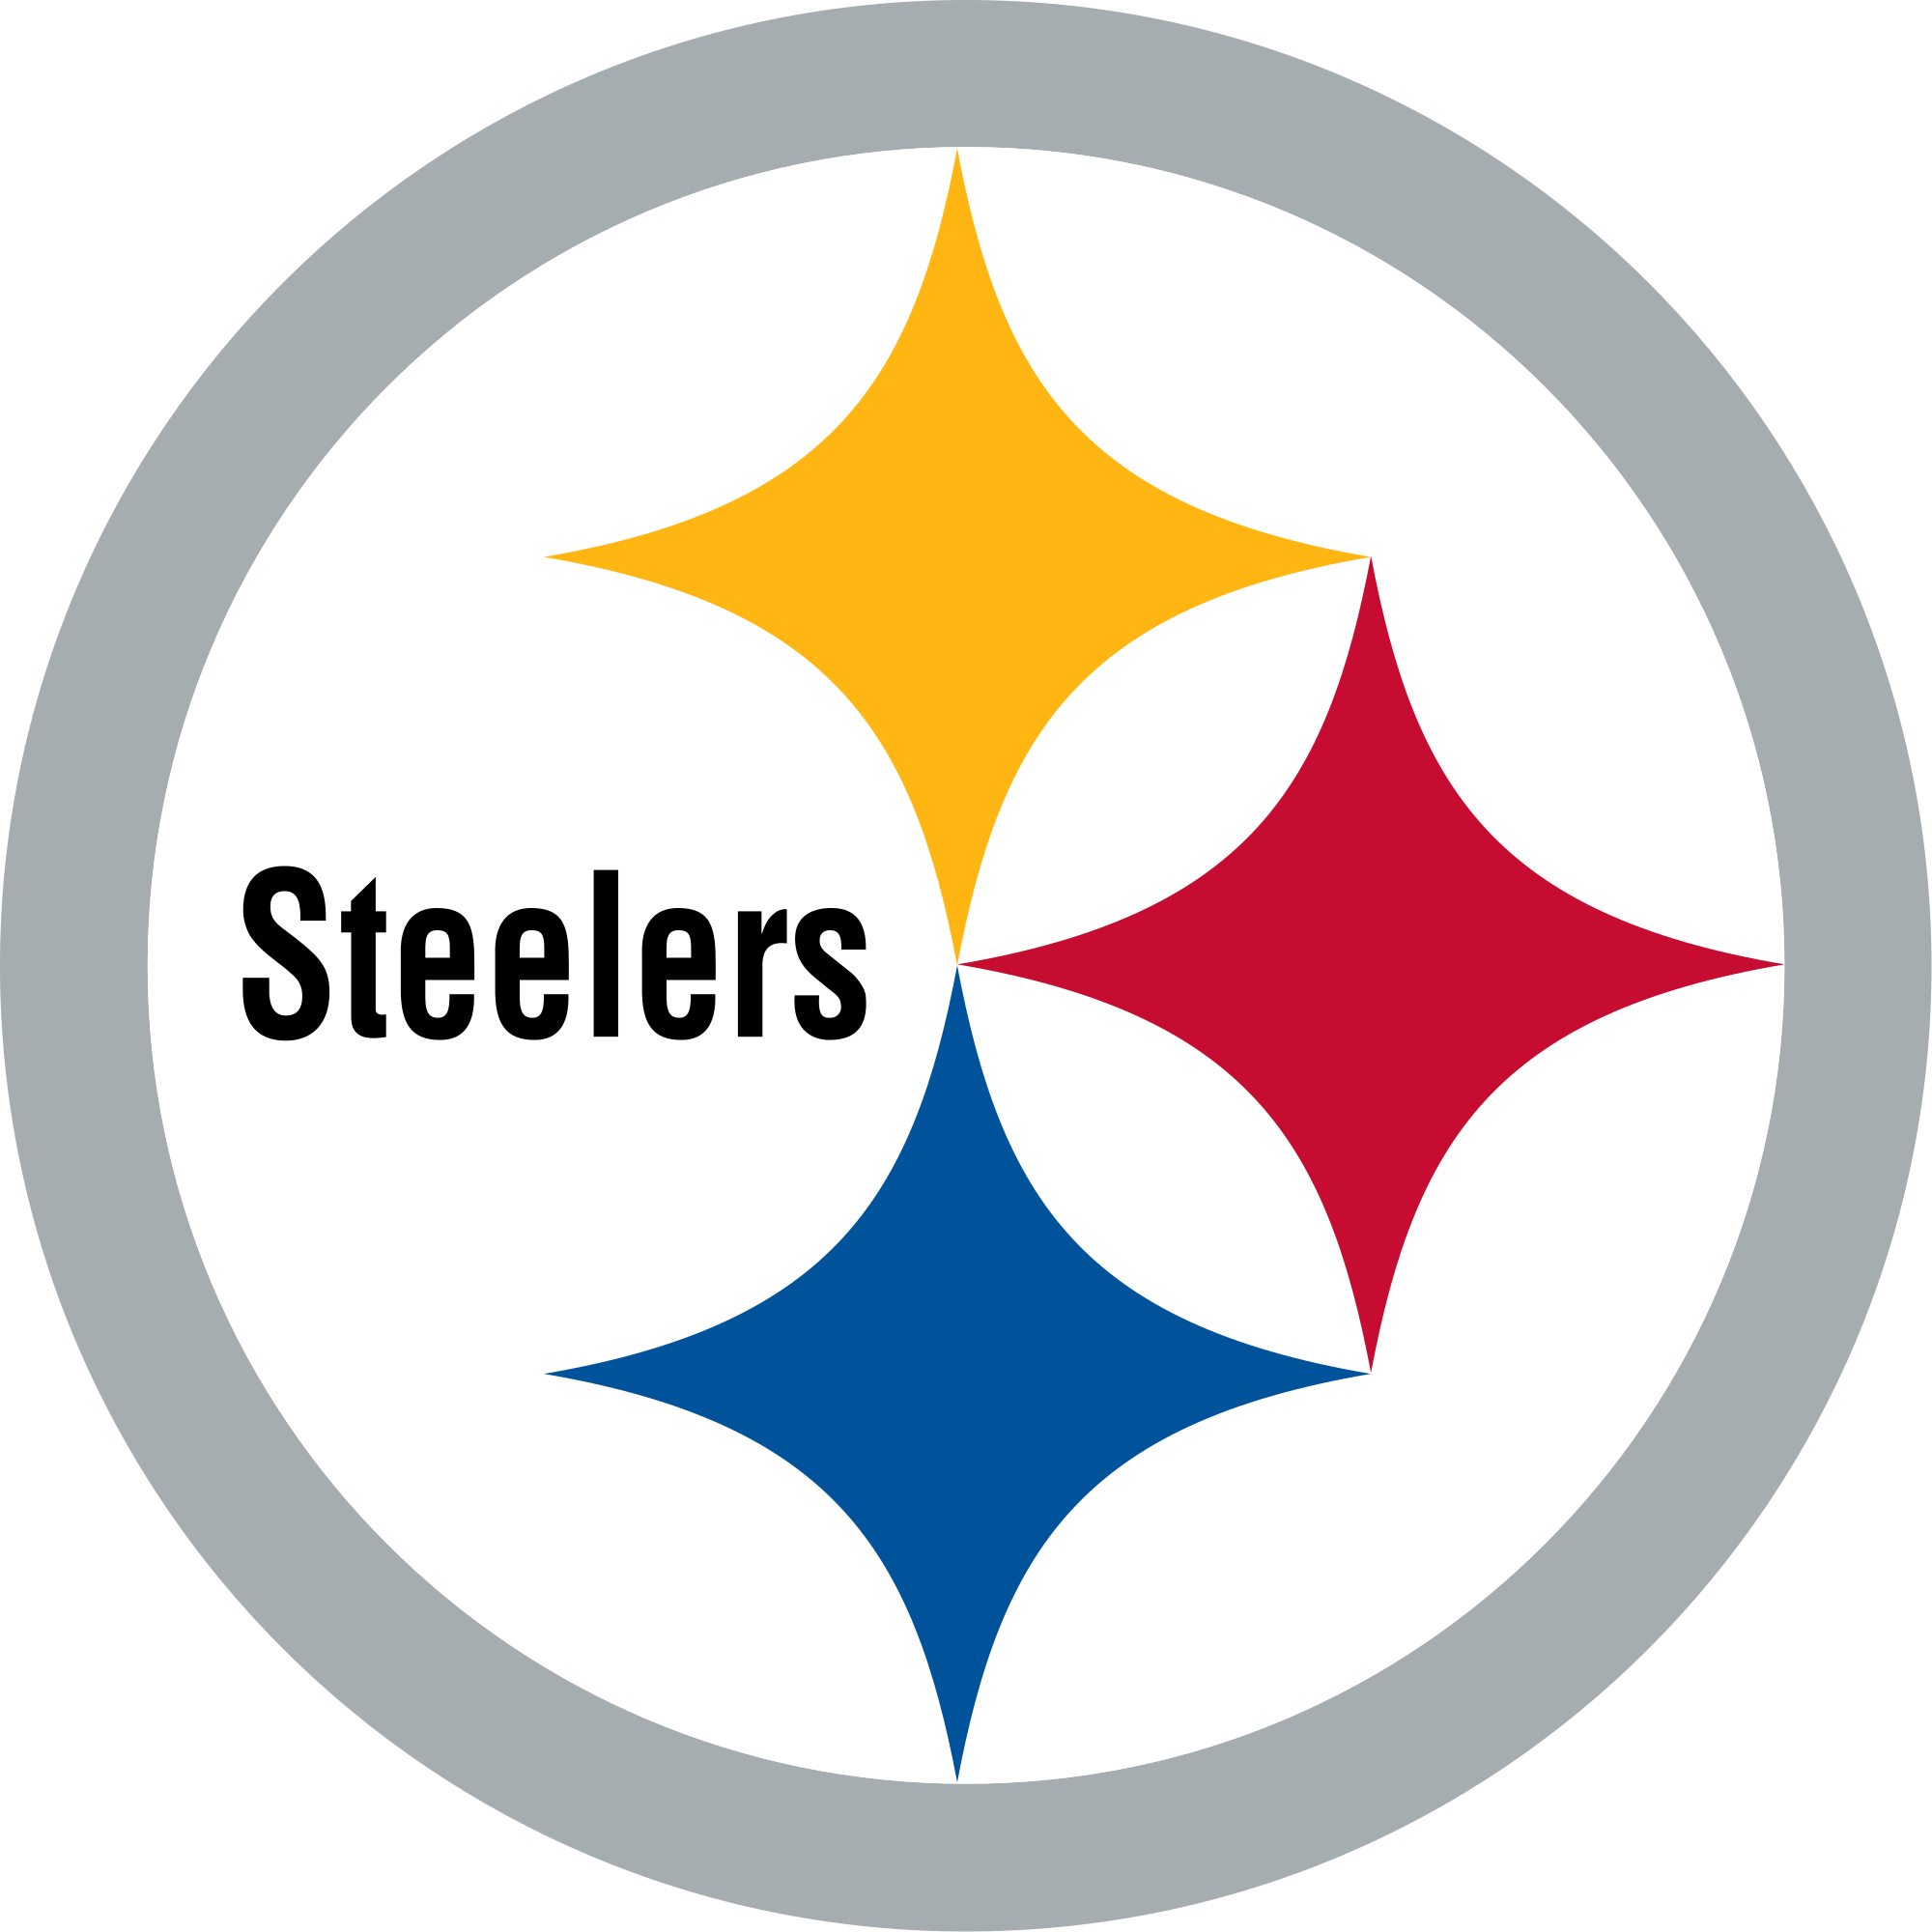 steelers logo.png